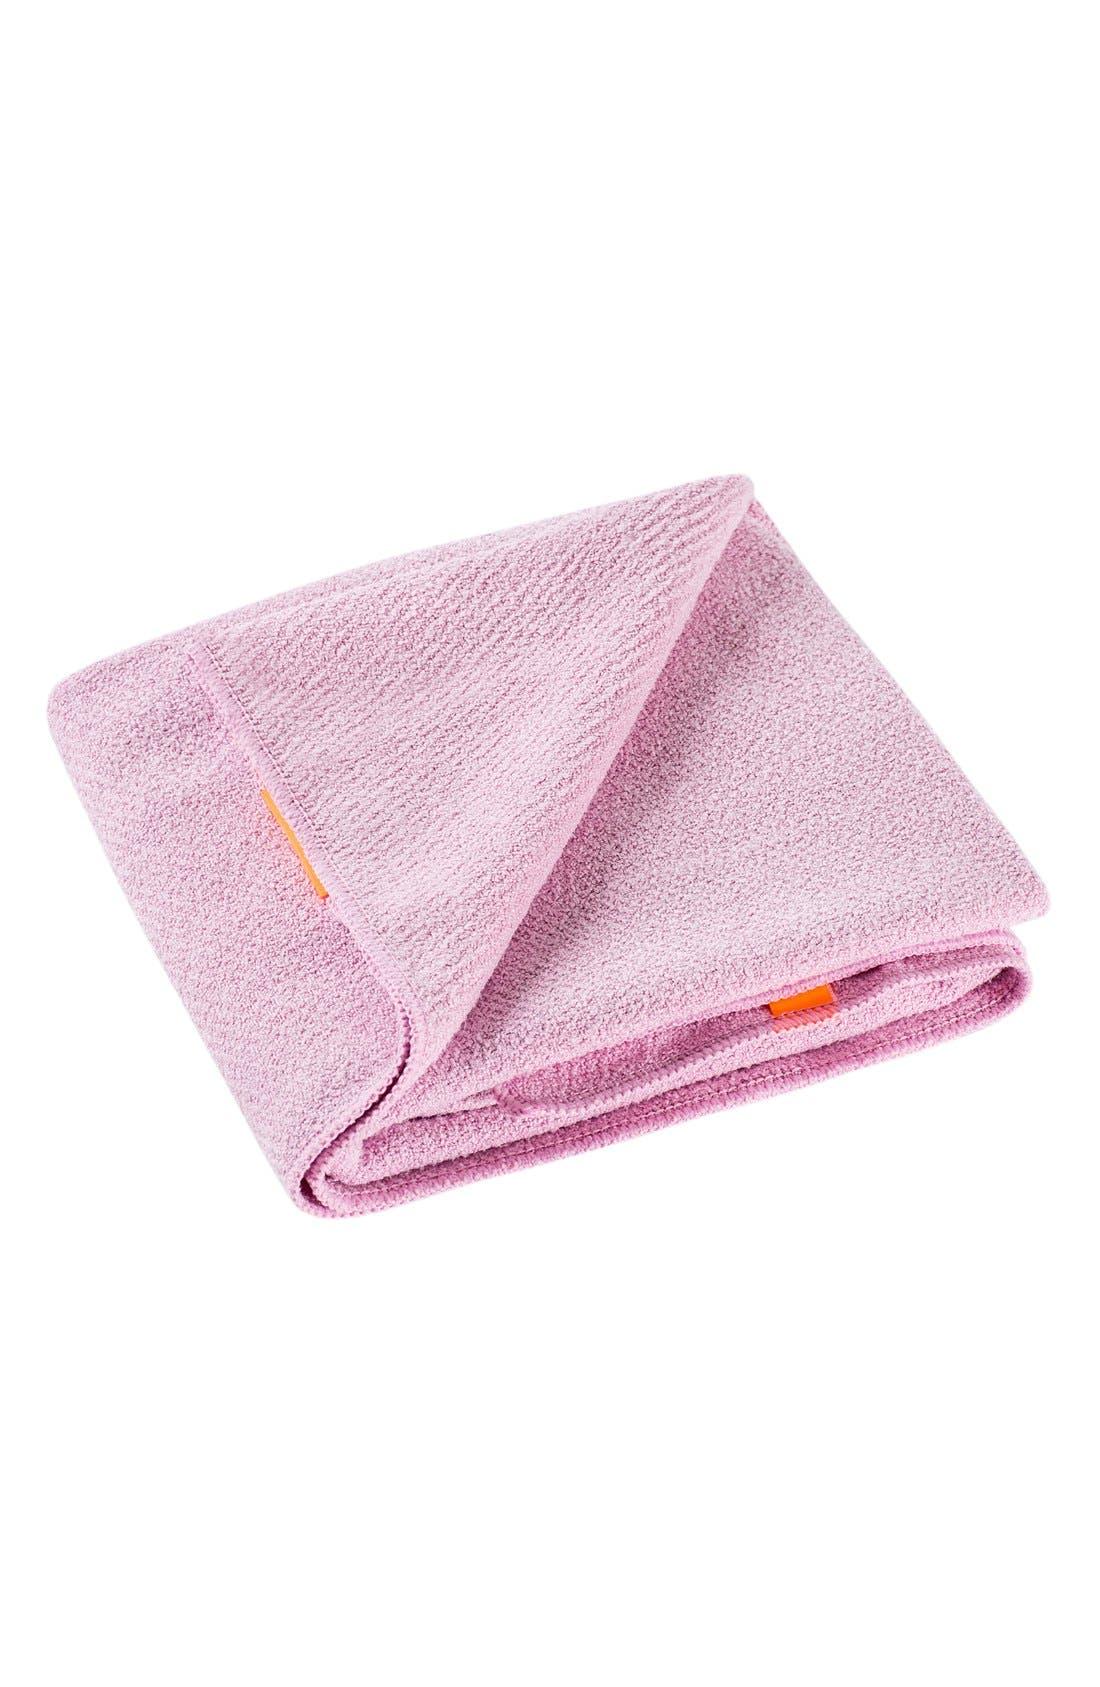 AQUIS Luxe Desert Rose Hair Towel